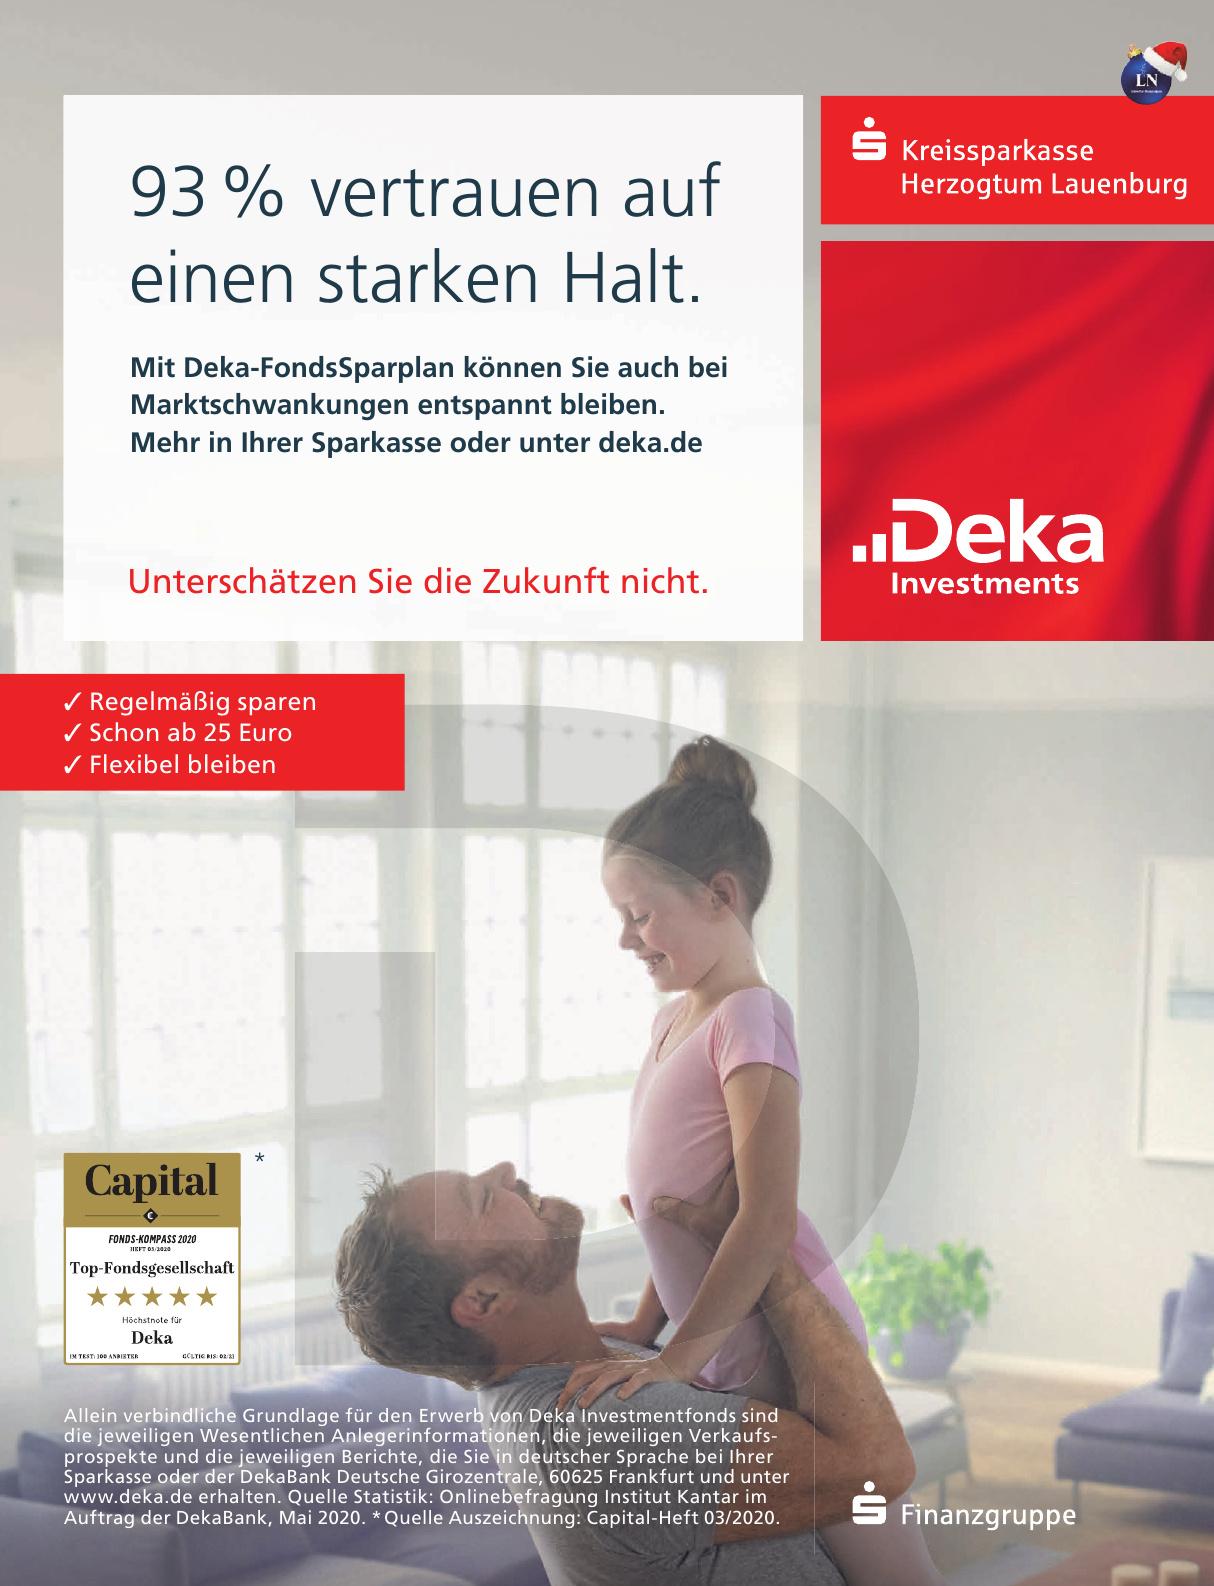 Deka Investments